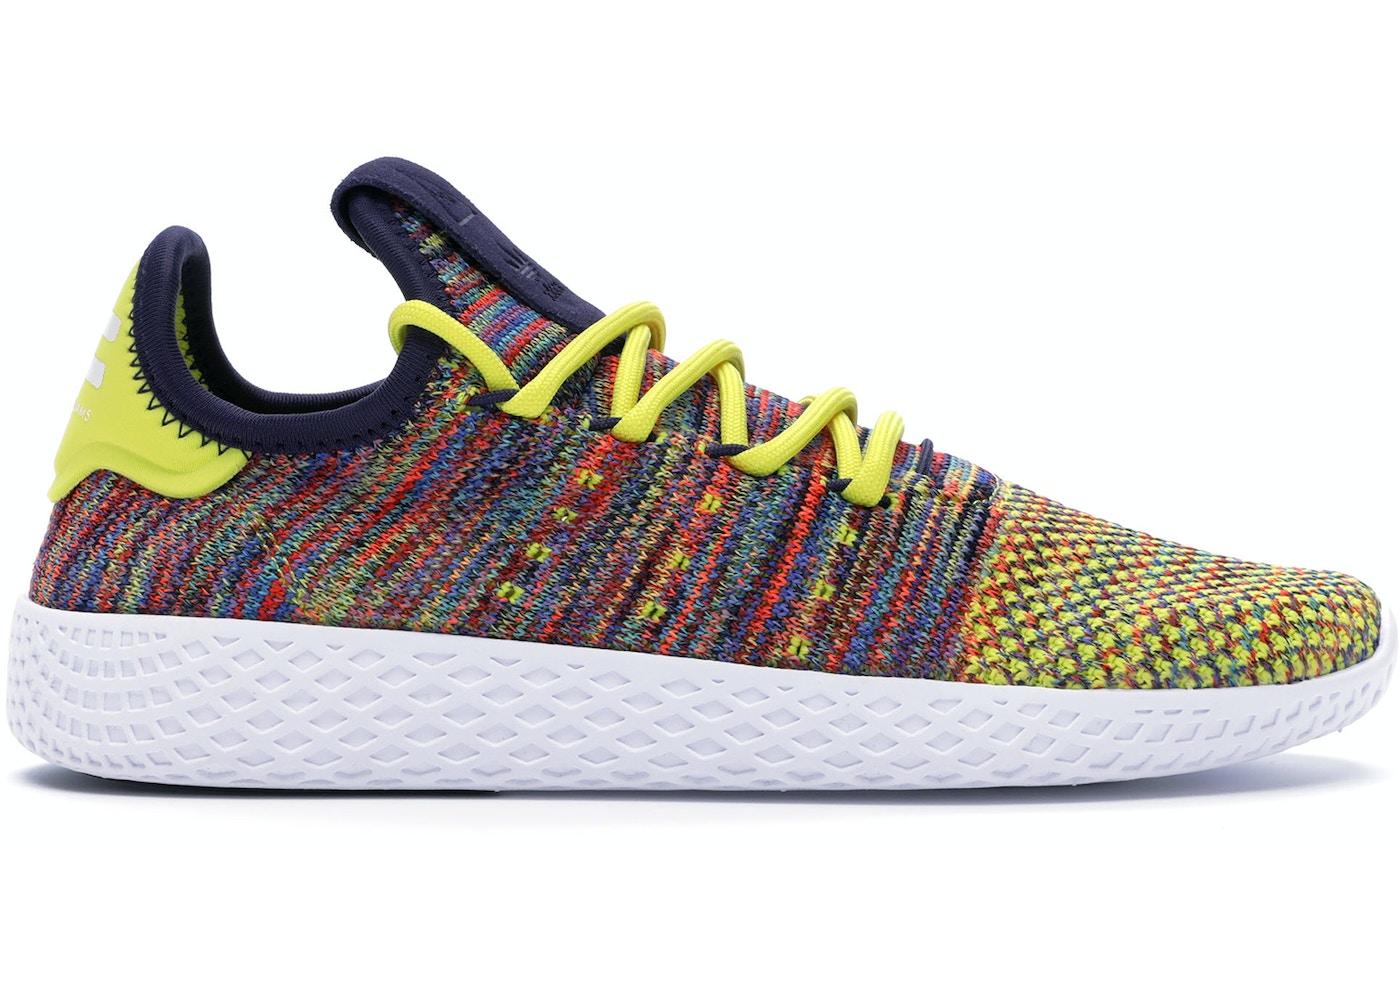 5384aabb03f1a adidas Tennis HU Pharrell Multi-Color - BY2673